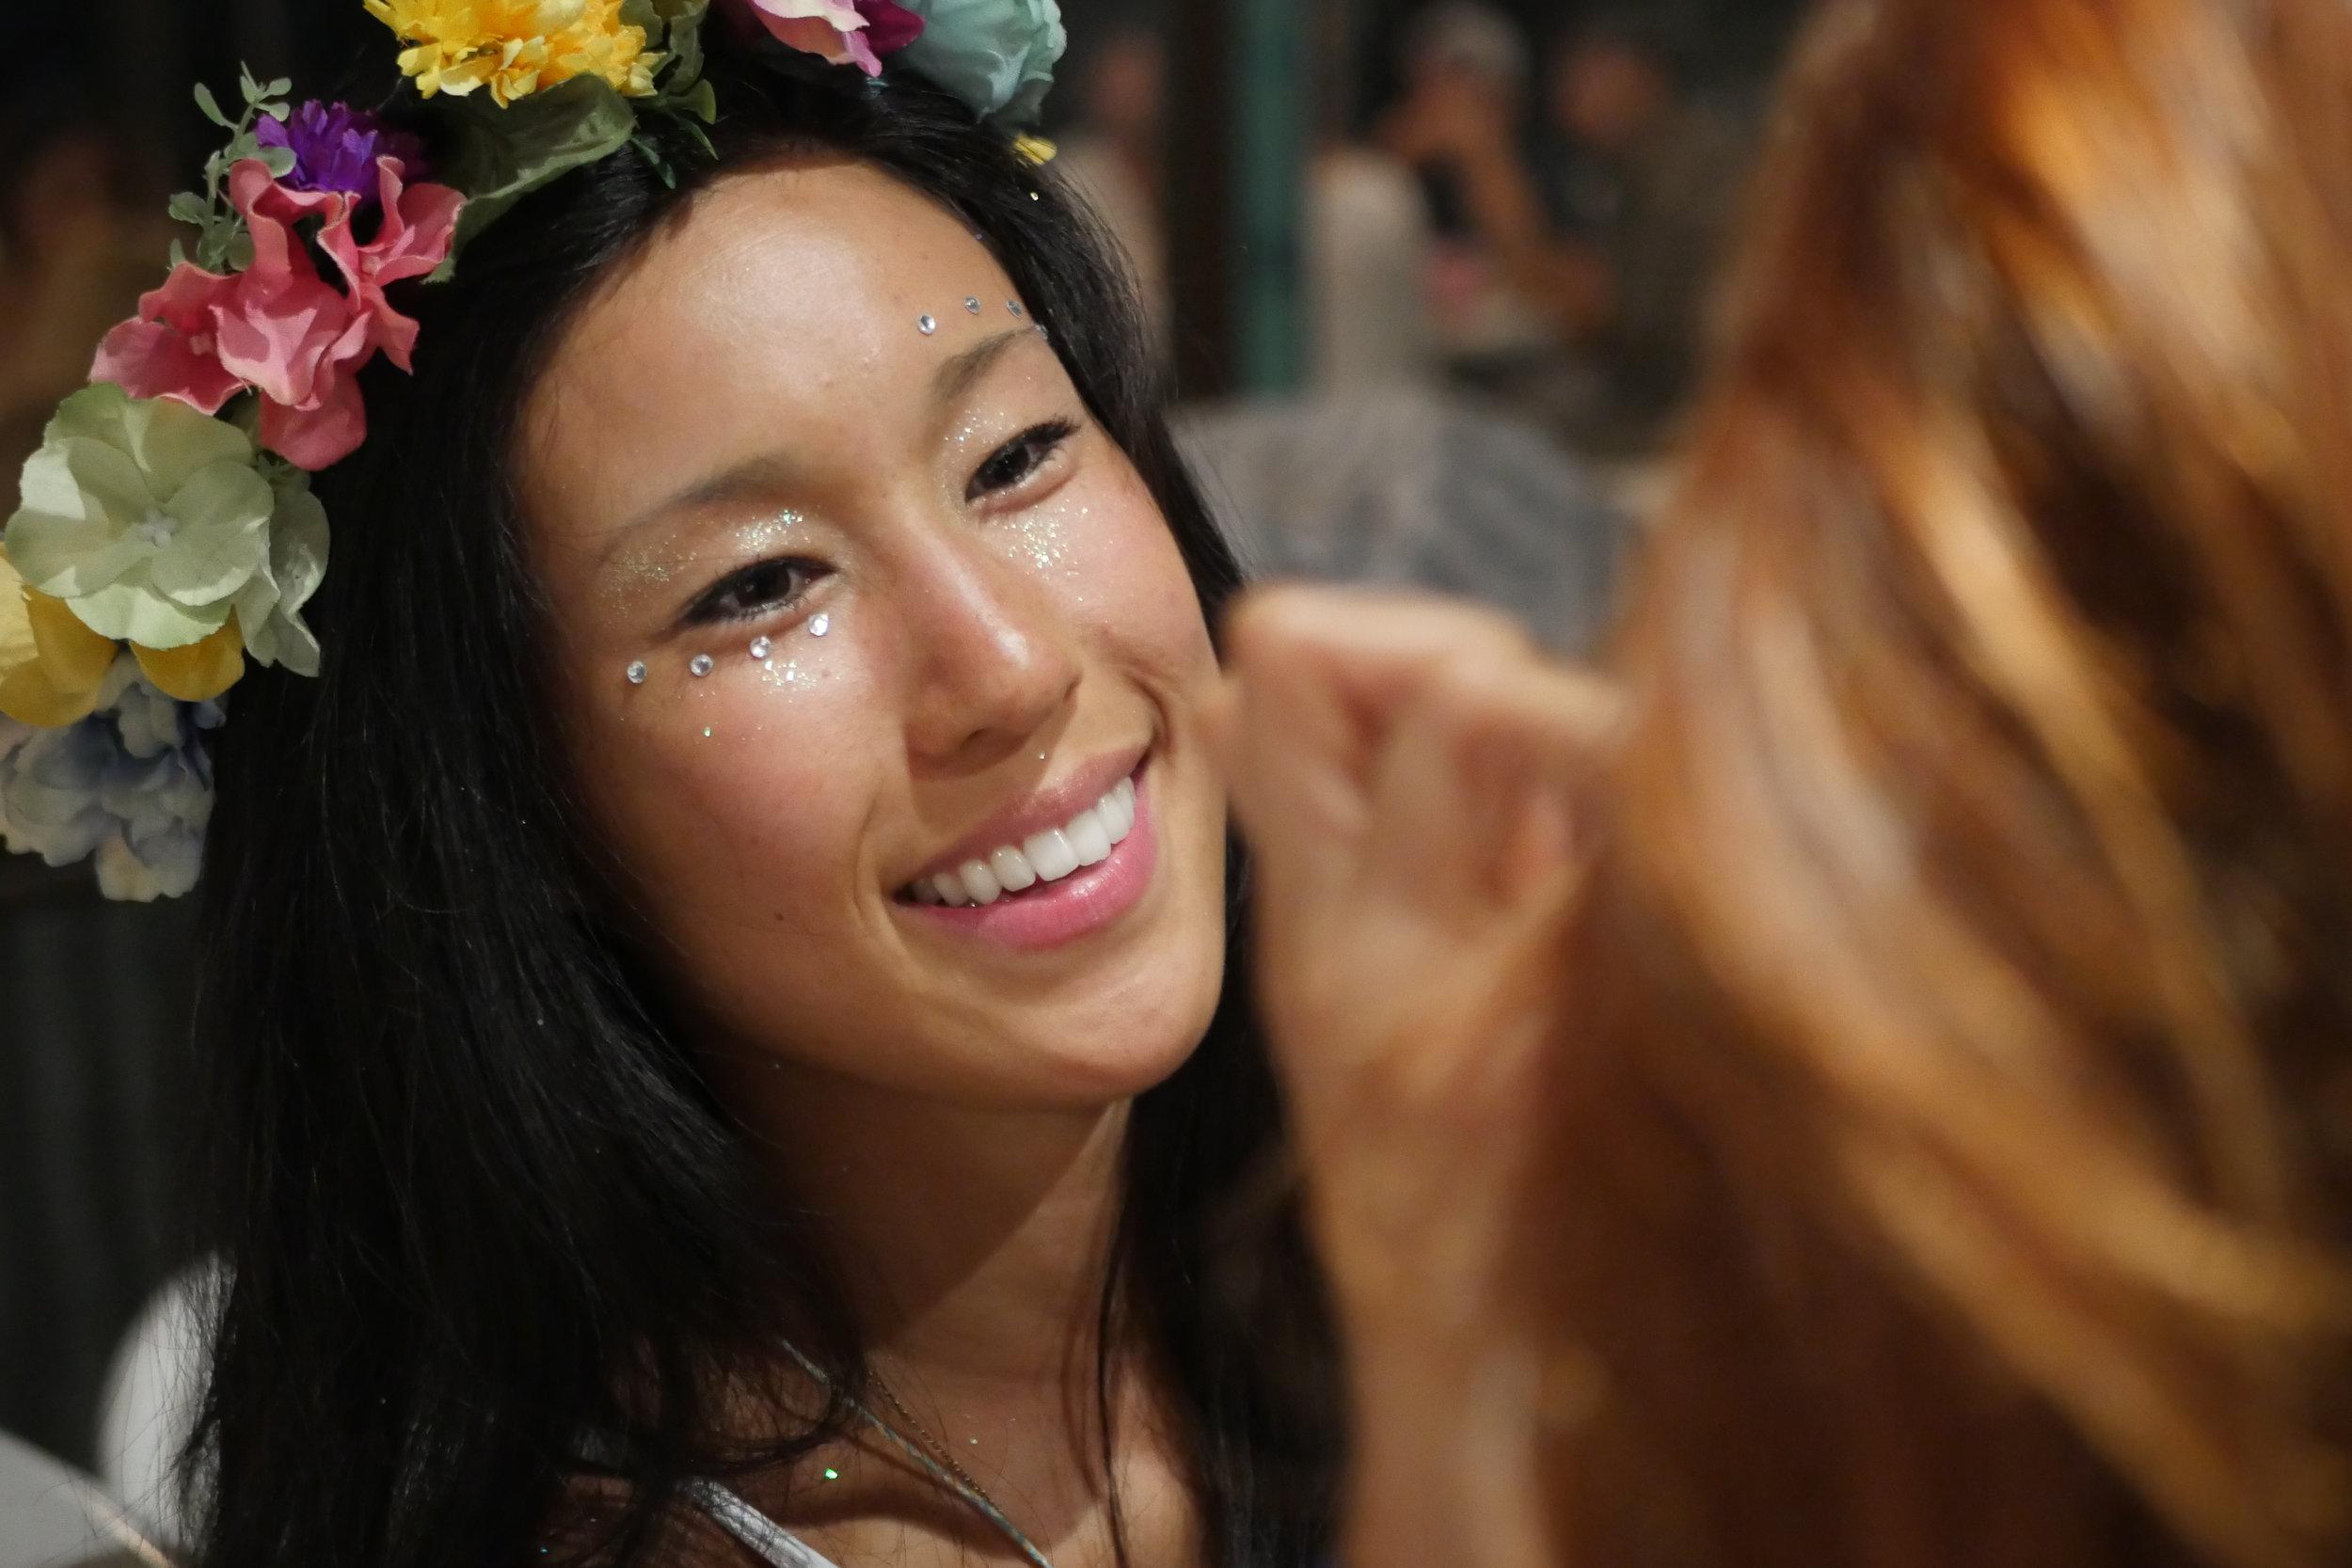 Co-Founder of Xanadu Heidi providing beautiful face art